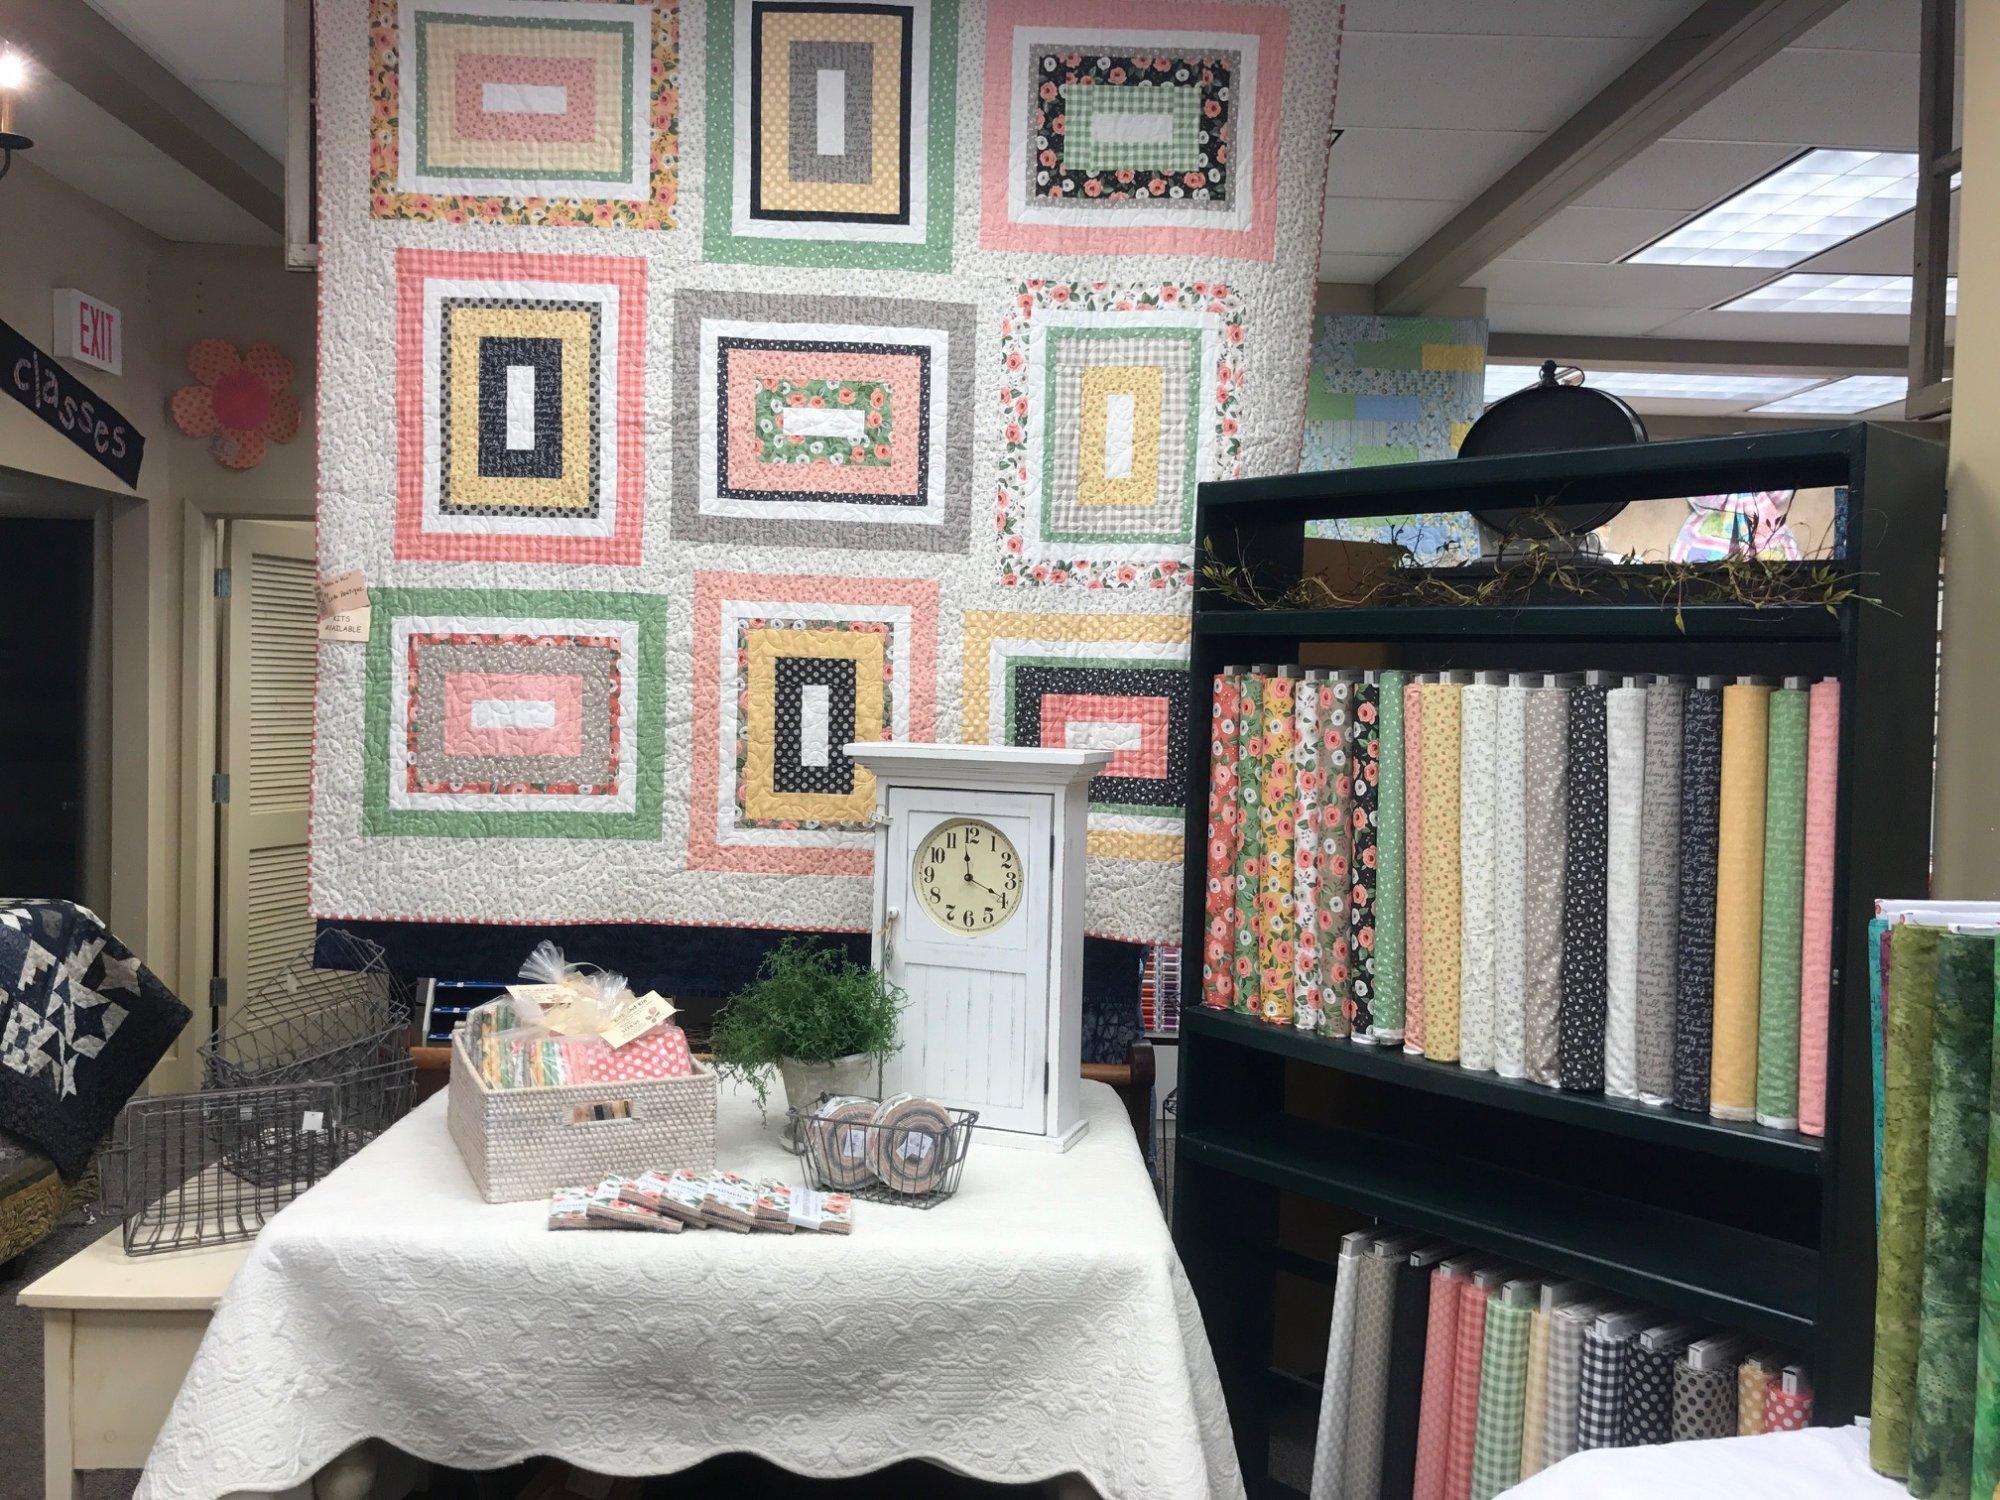 Country Sampler   Omaha, NE   Quilt Shop & Country Store : lincoln ne quilt shops - Adamdwight.com